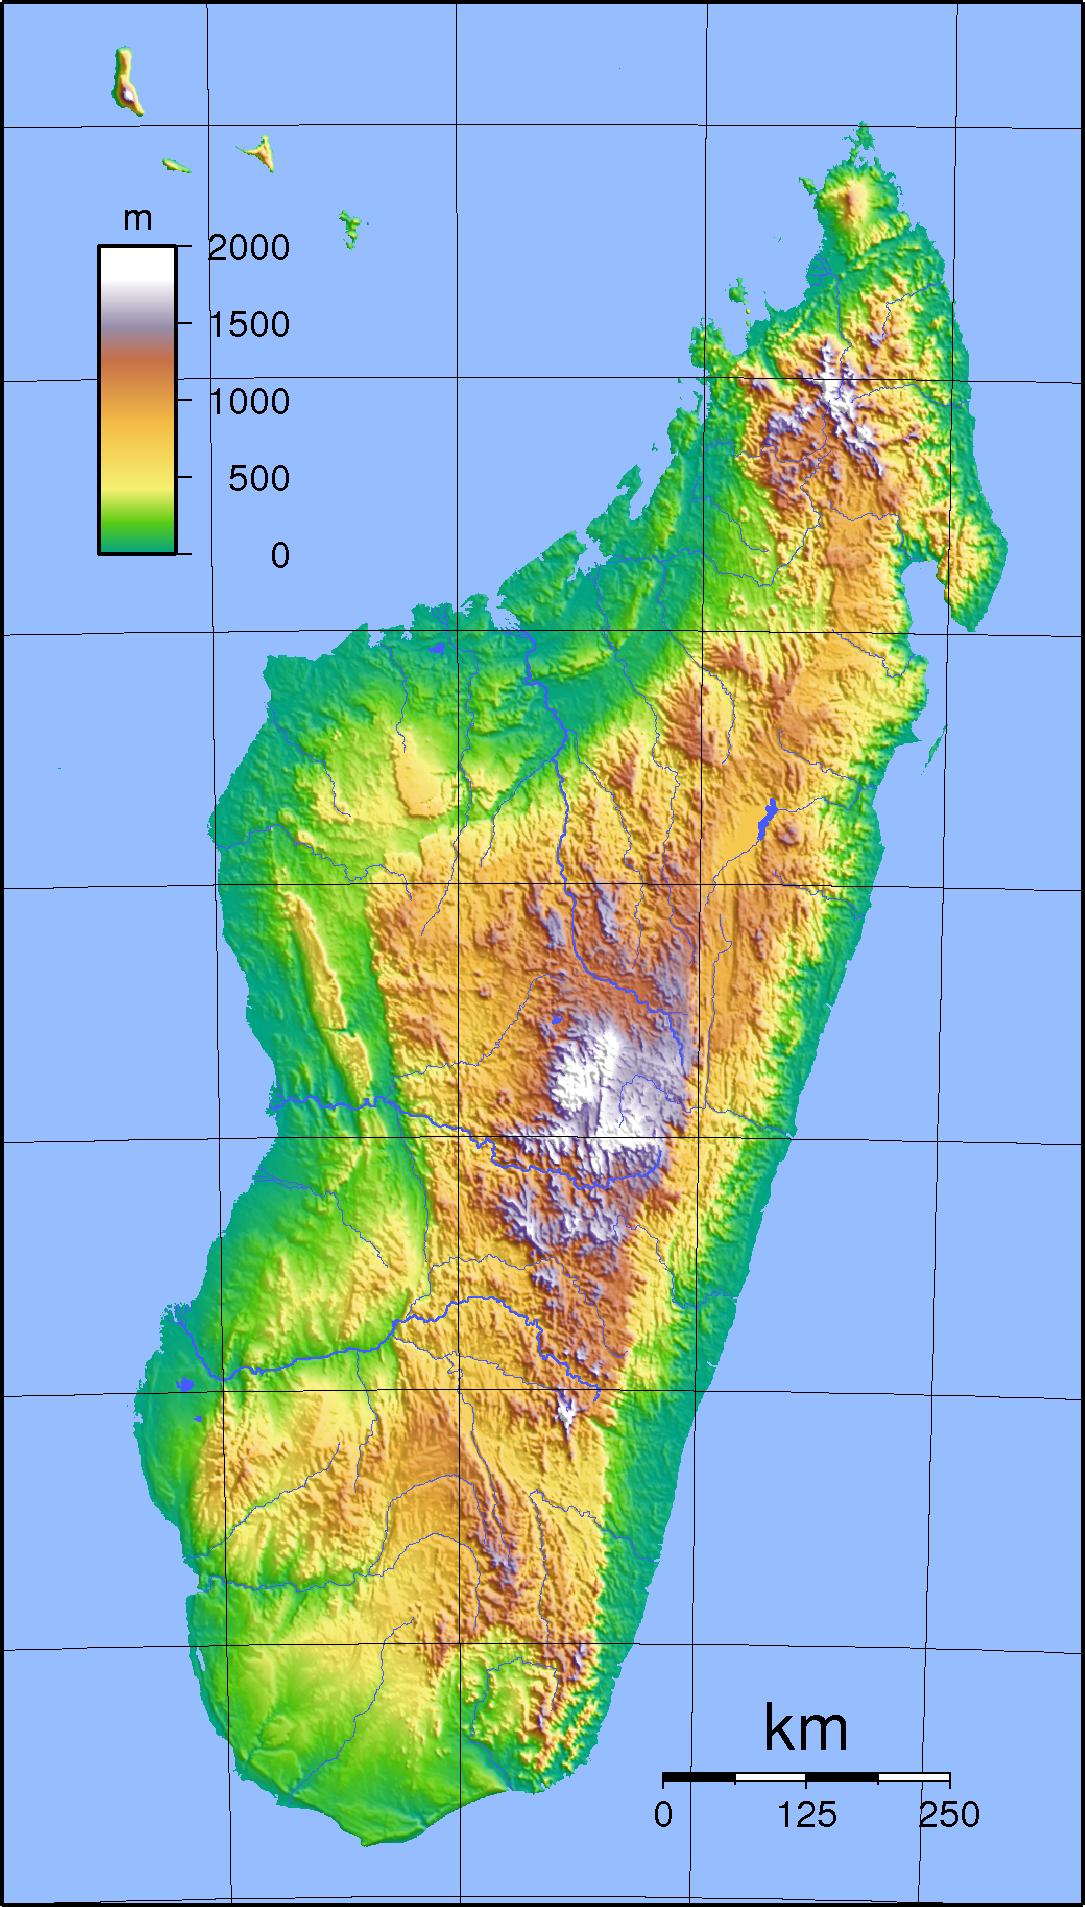 Madagaskar Karte.Madagaskarplan Wikipedia